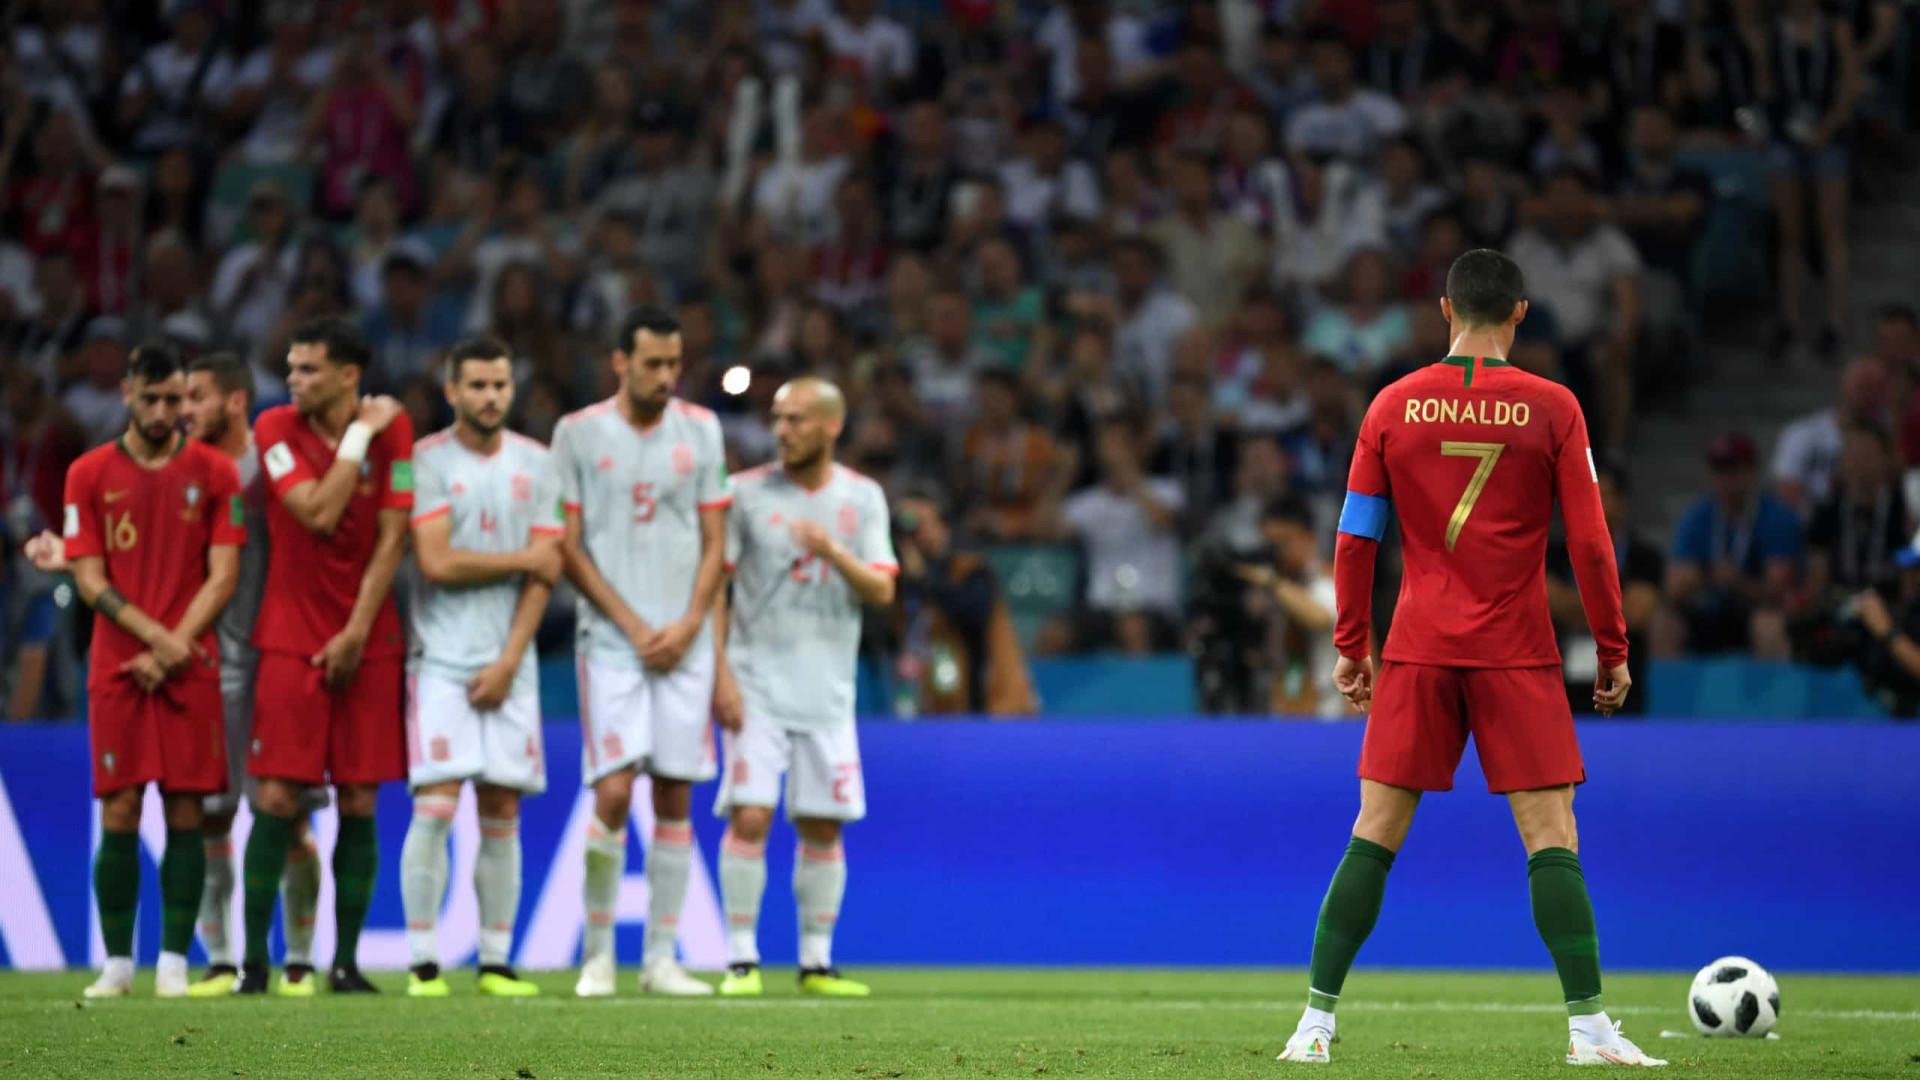 Portugal mantém o 5.º lugar no ranking da FIFA